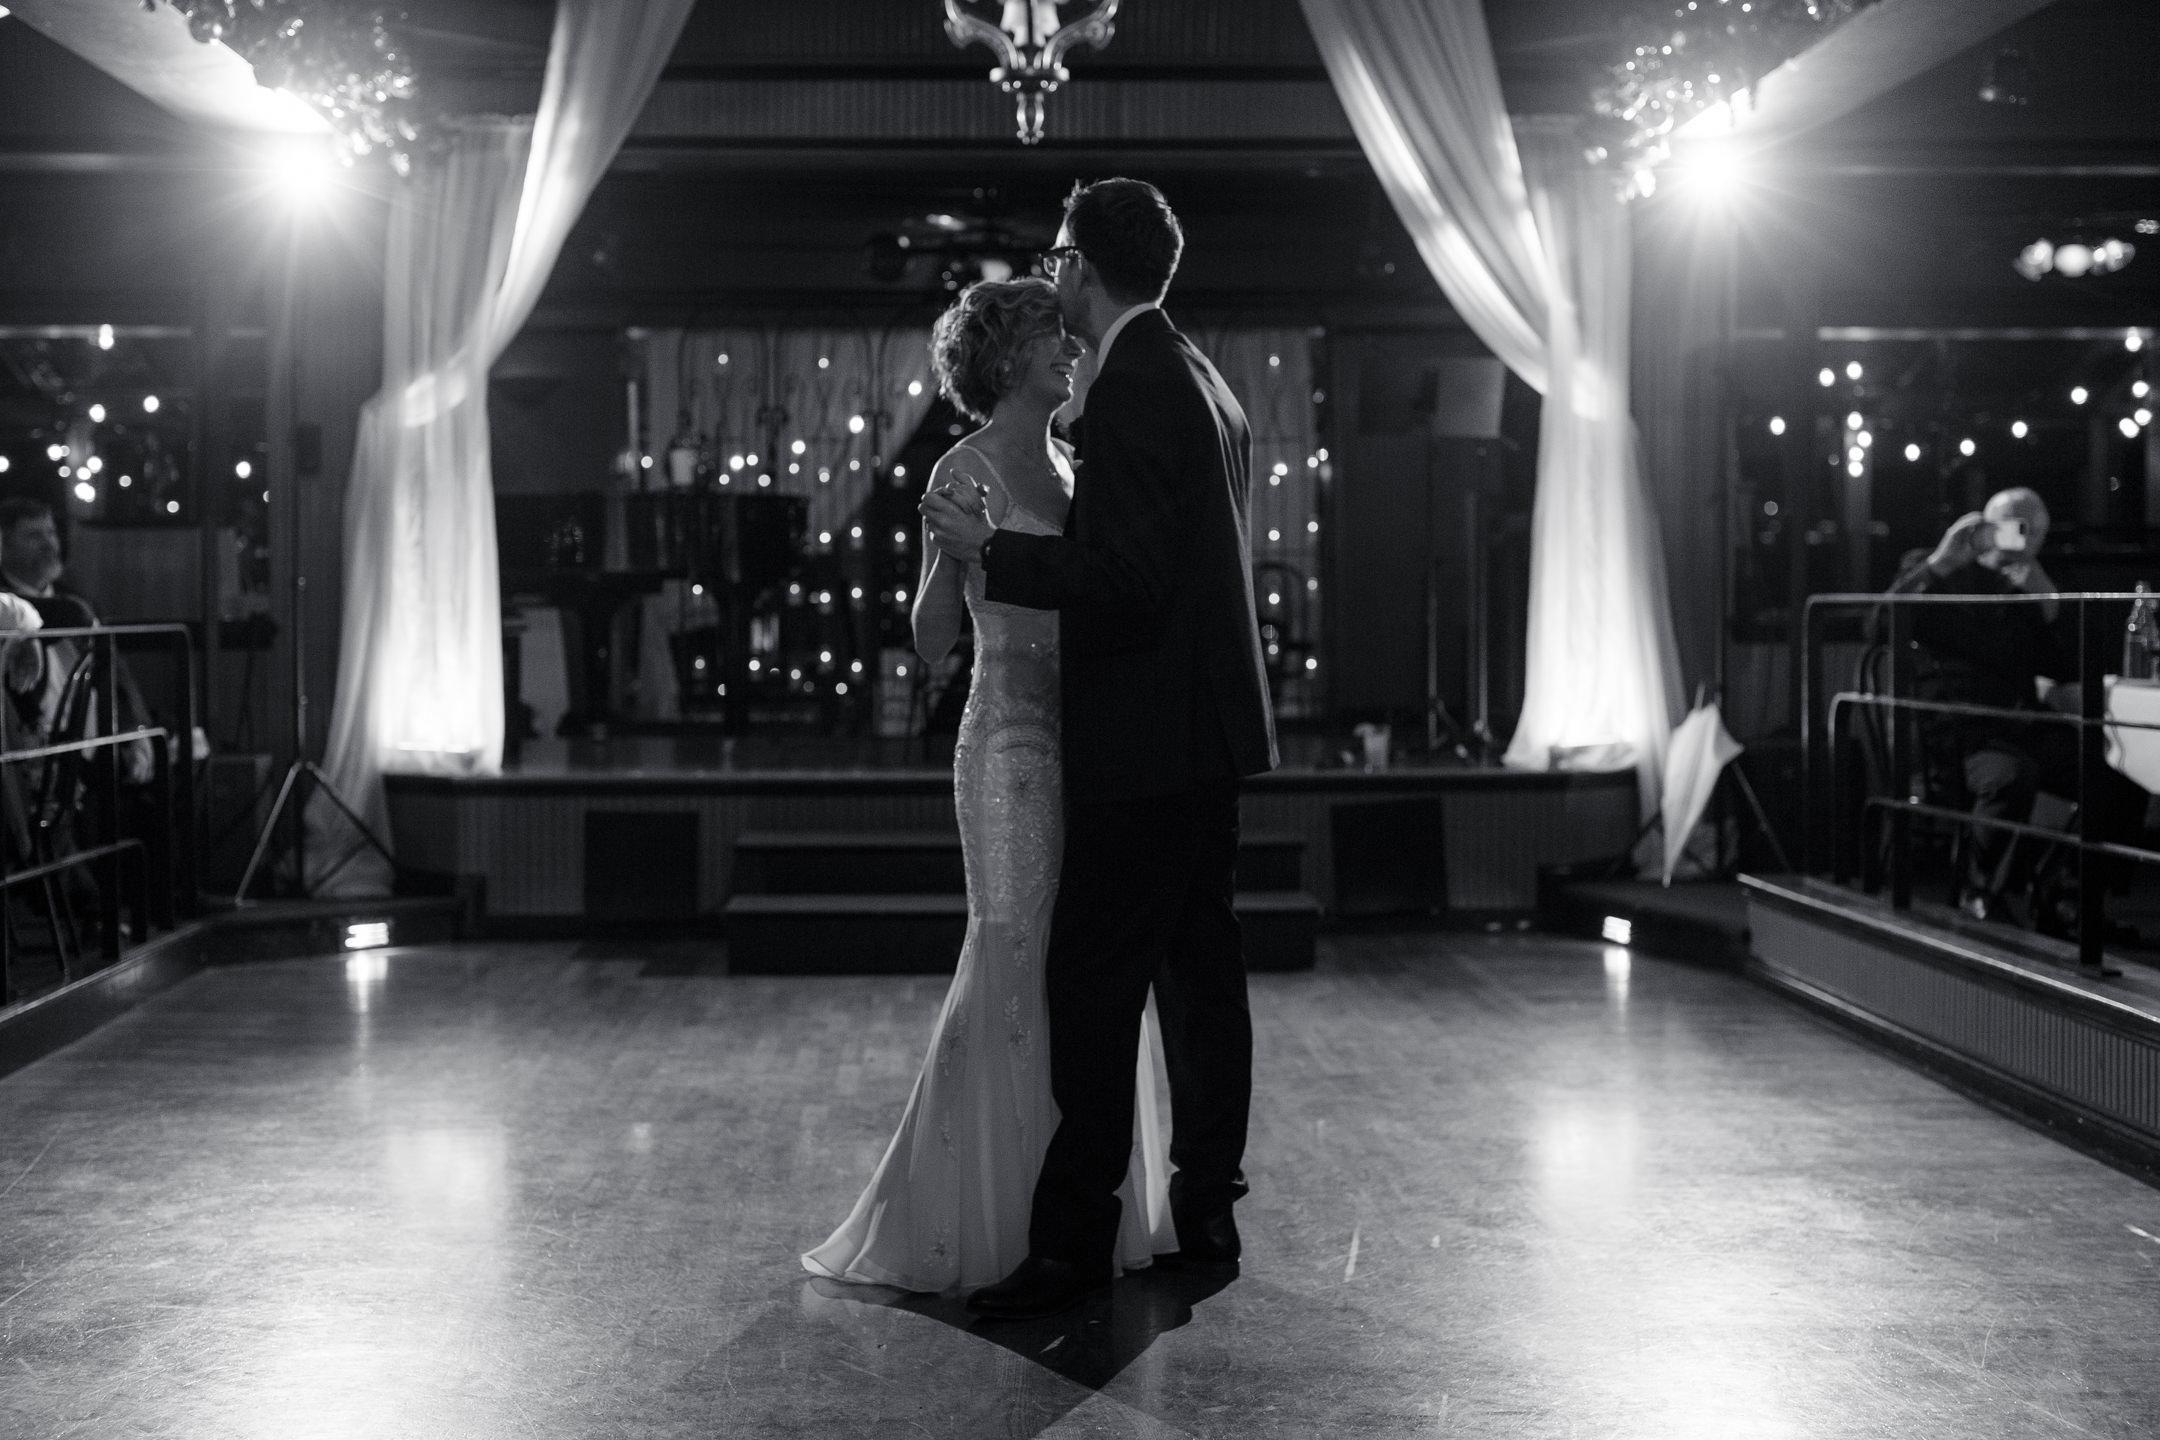 Documentary-Wedding-Photography-Andrew-Tat-Gabi & Kim-28.jpg